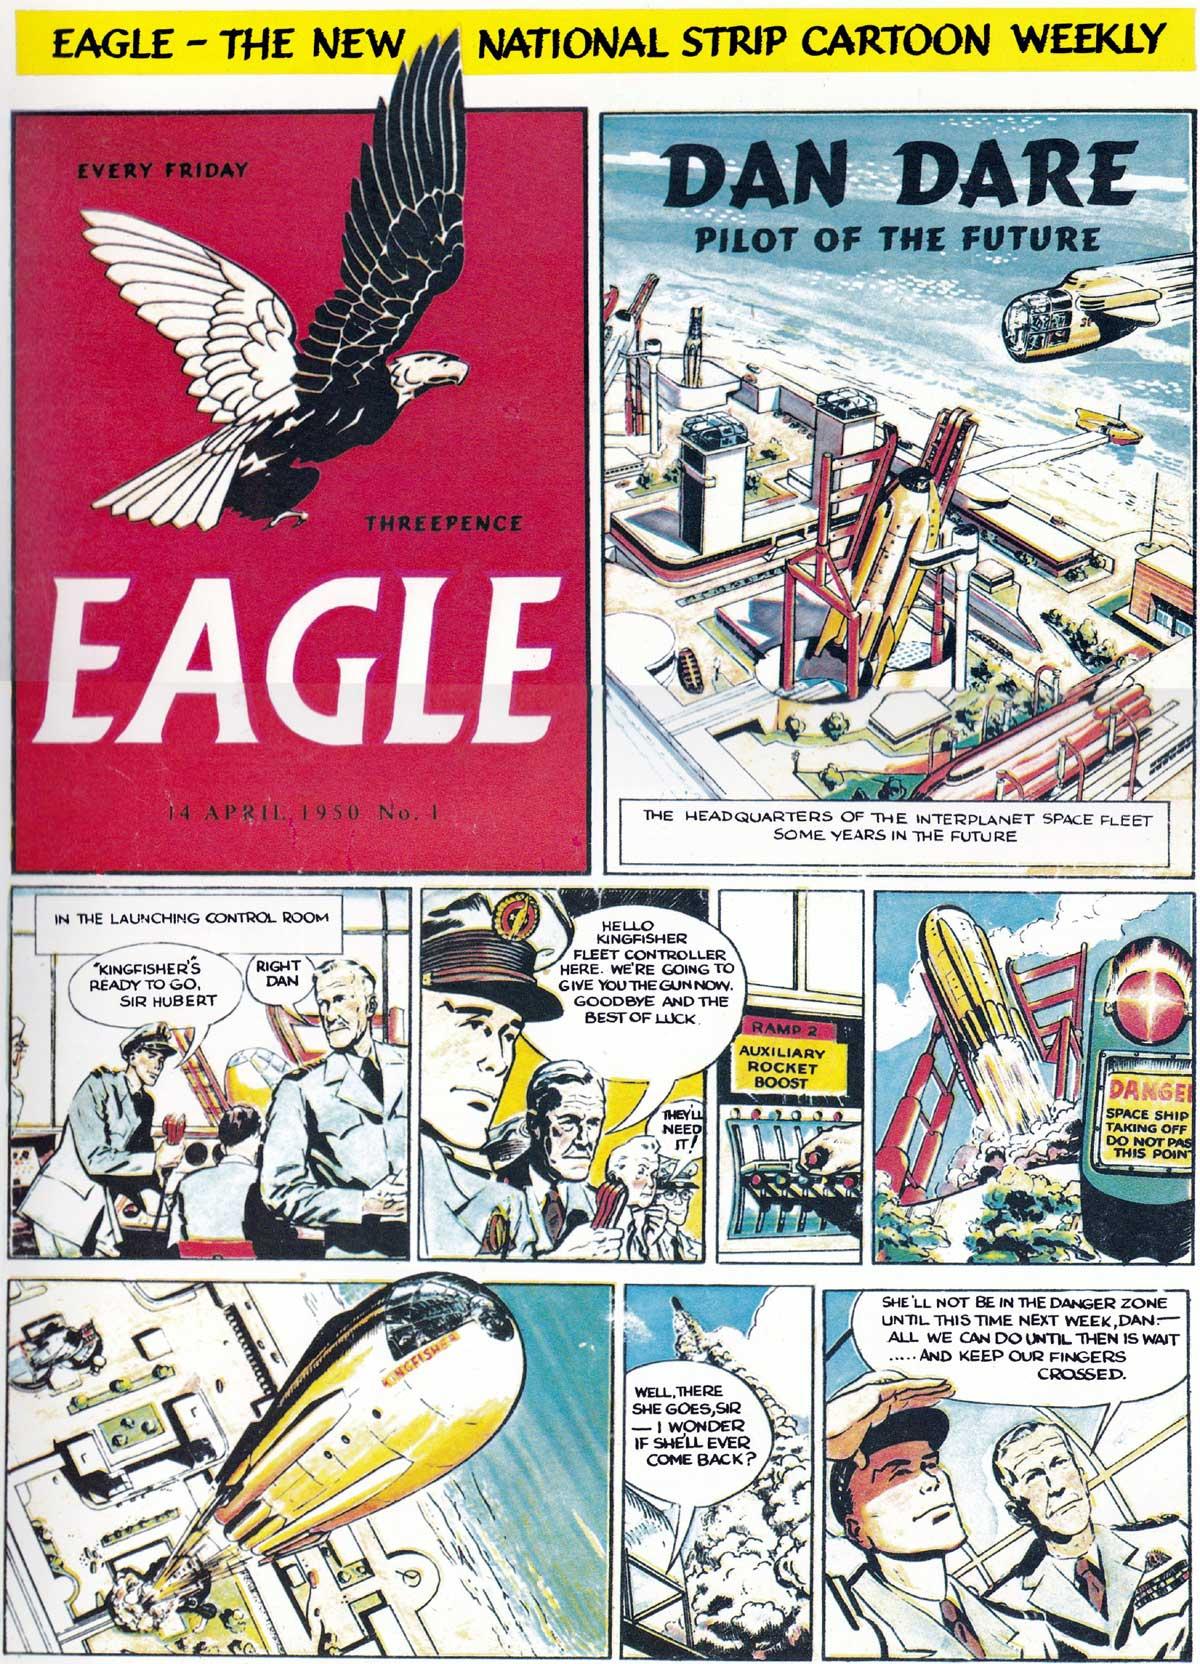 1st copy of Eagle, 14th April 1950